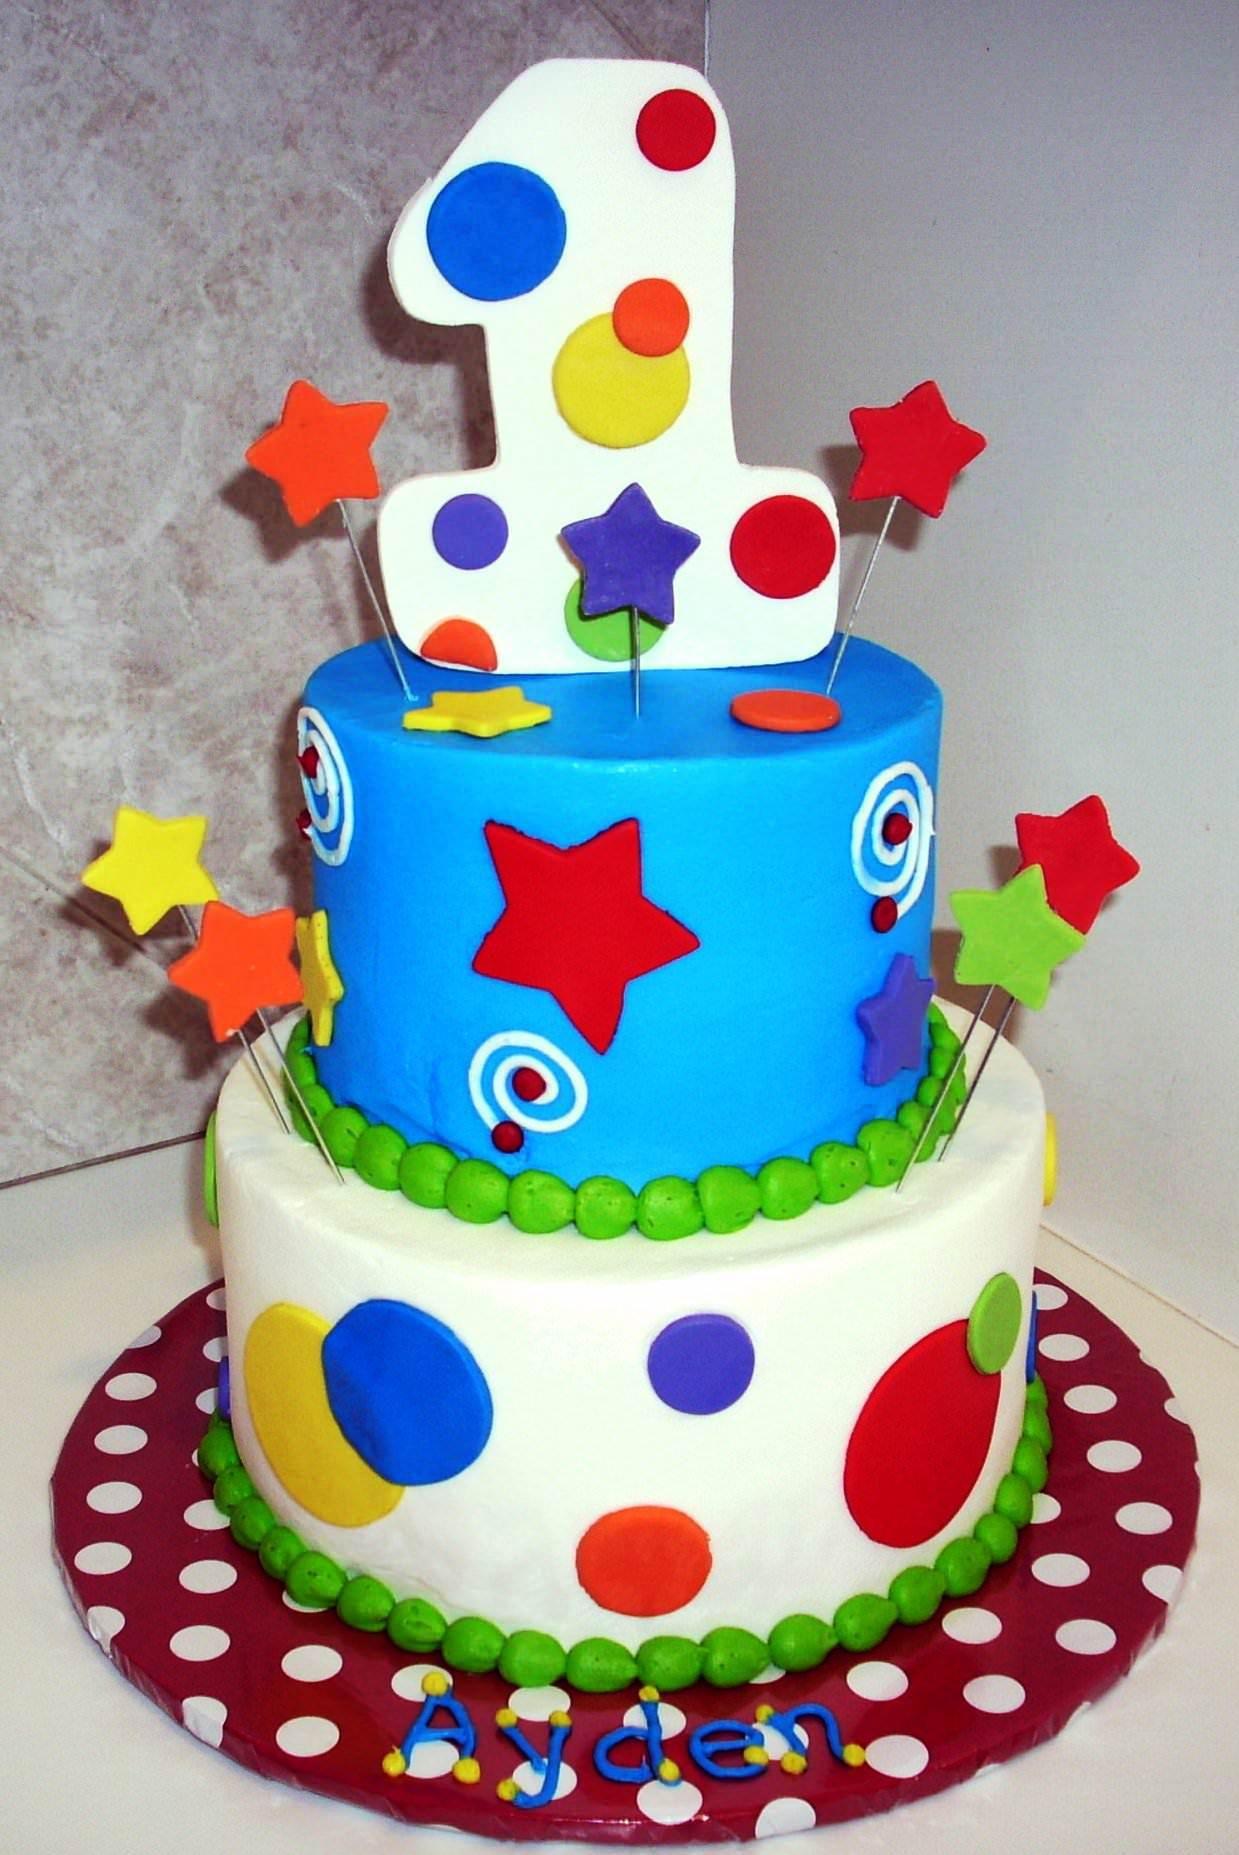 1st Year Birthday Cakes For Boys Birthday Cake Kids 1st Birthday Cakes First Birthday Cakes